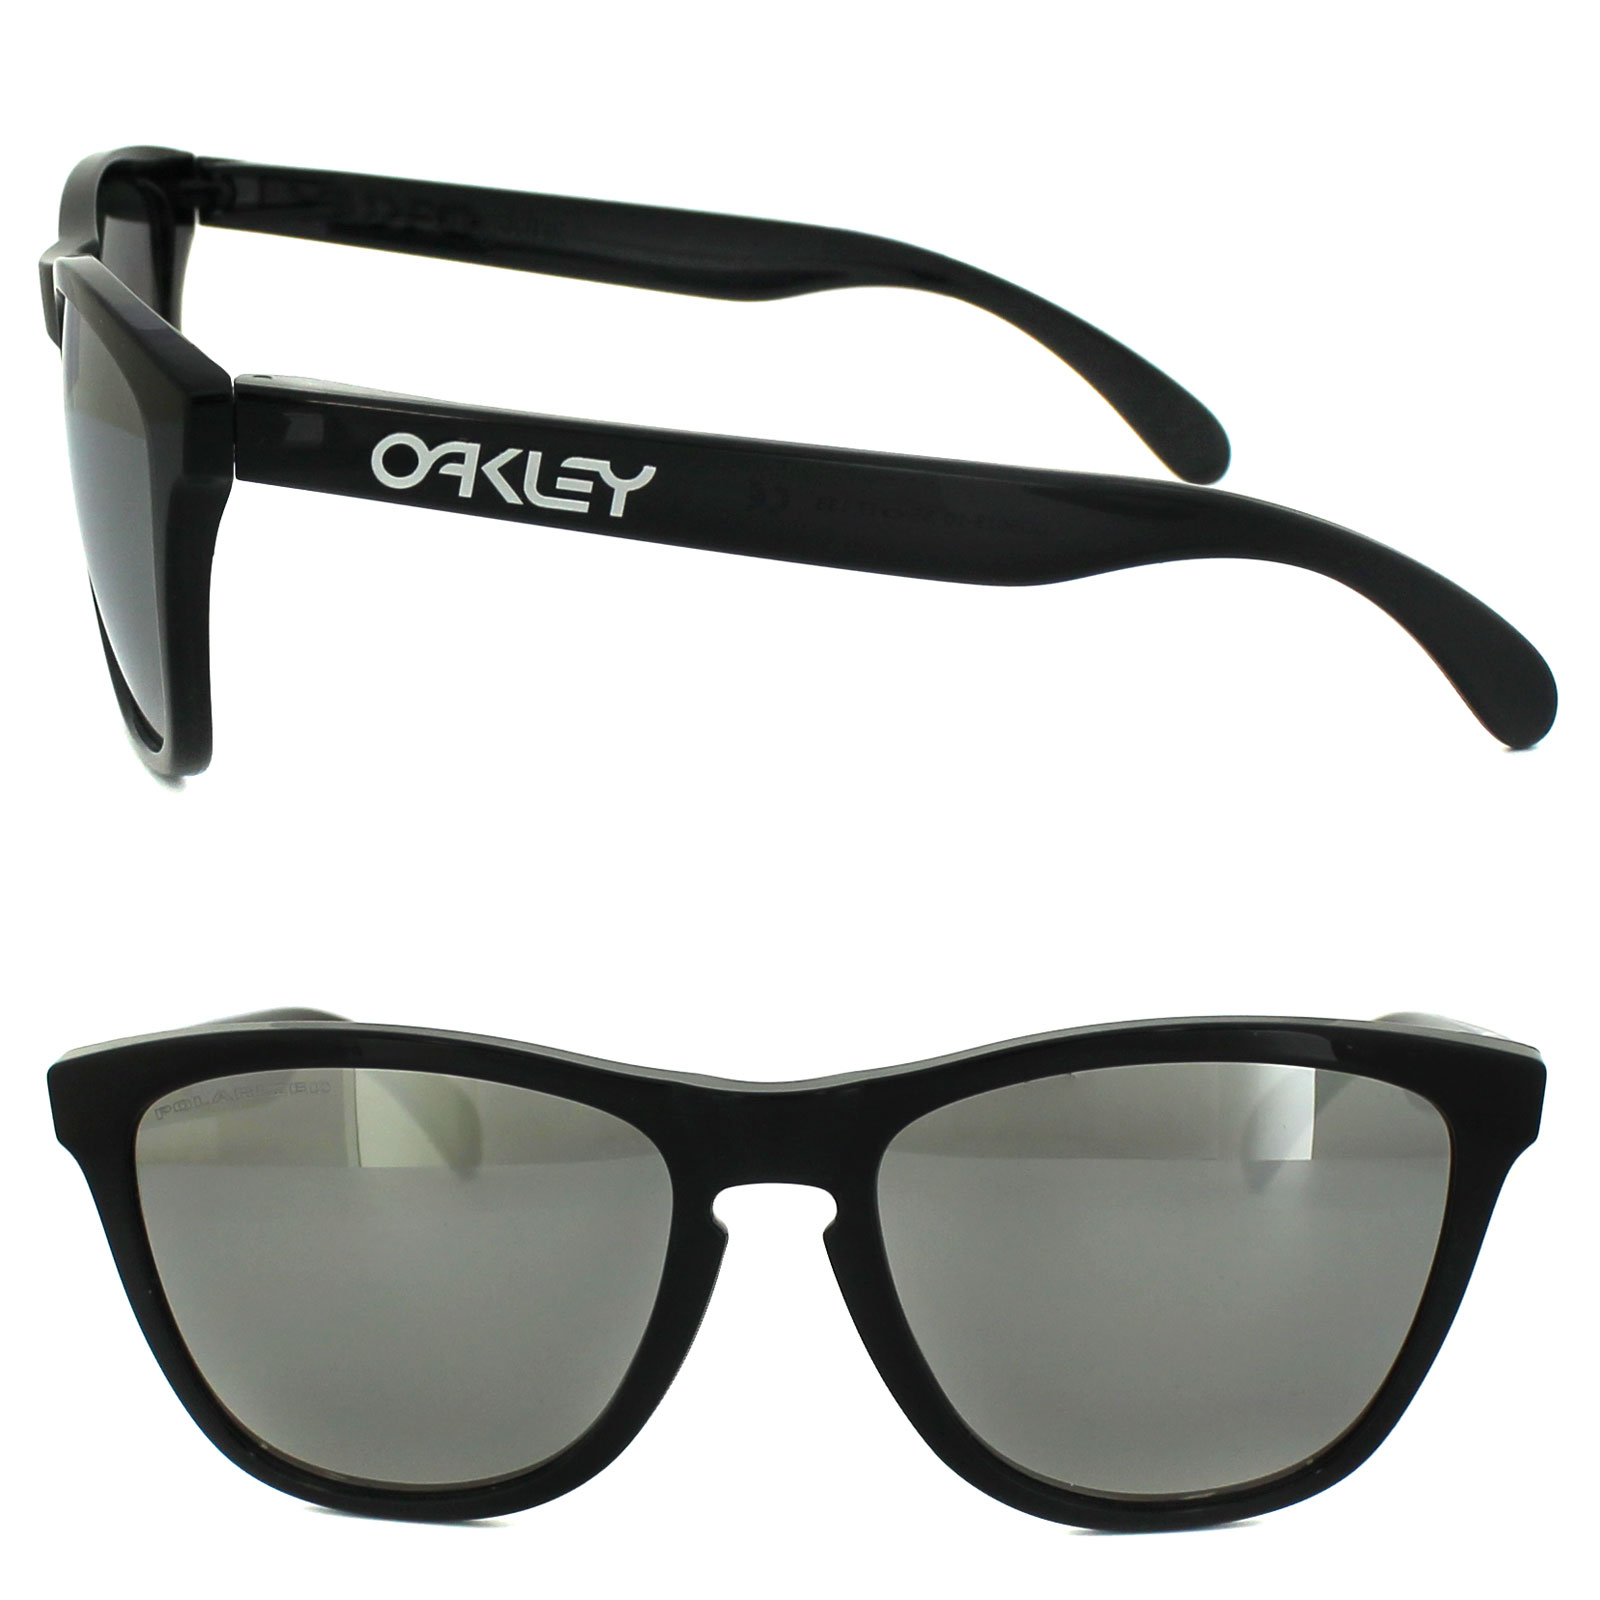 Oakley Frogskins Black Ink / Chrome Iridium Polarized 9013-10 CvIdn6cp